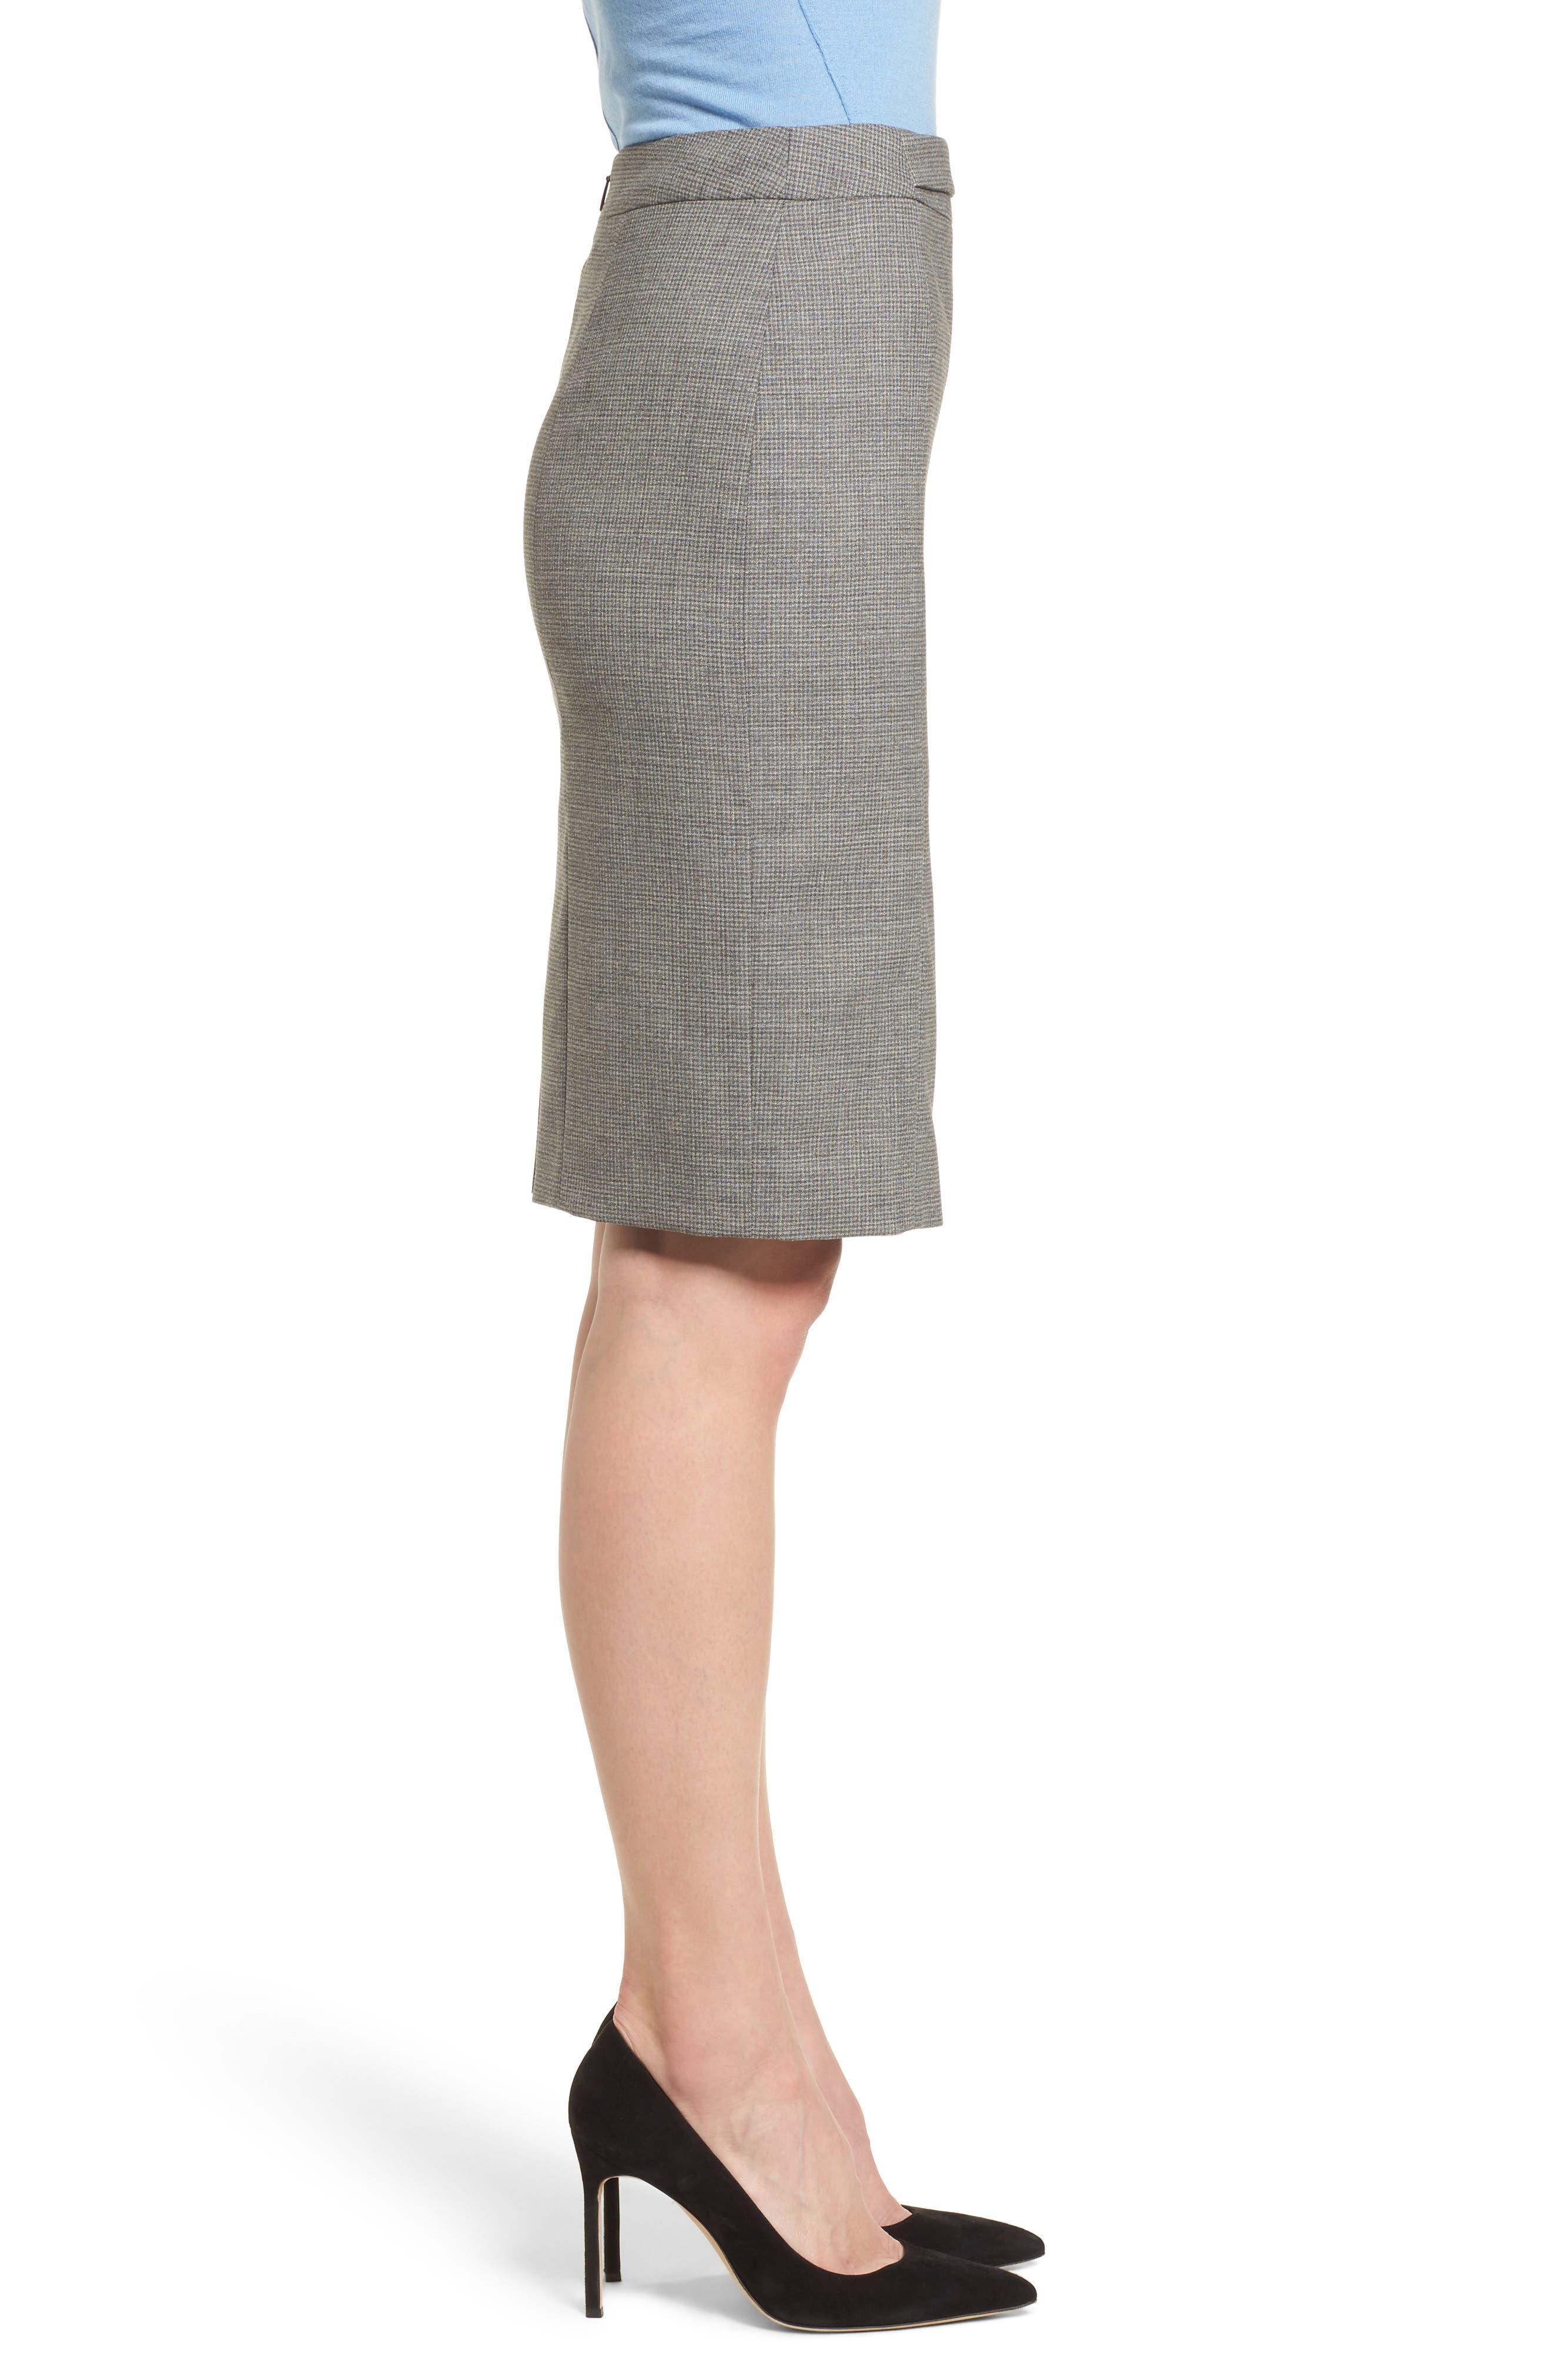 Vewisa Check Wool Suit Skirt,                             Alternate thumbnail 3, color,                             Cozy Grey Melange Fantasy